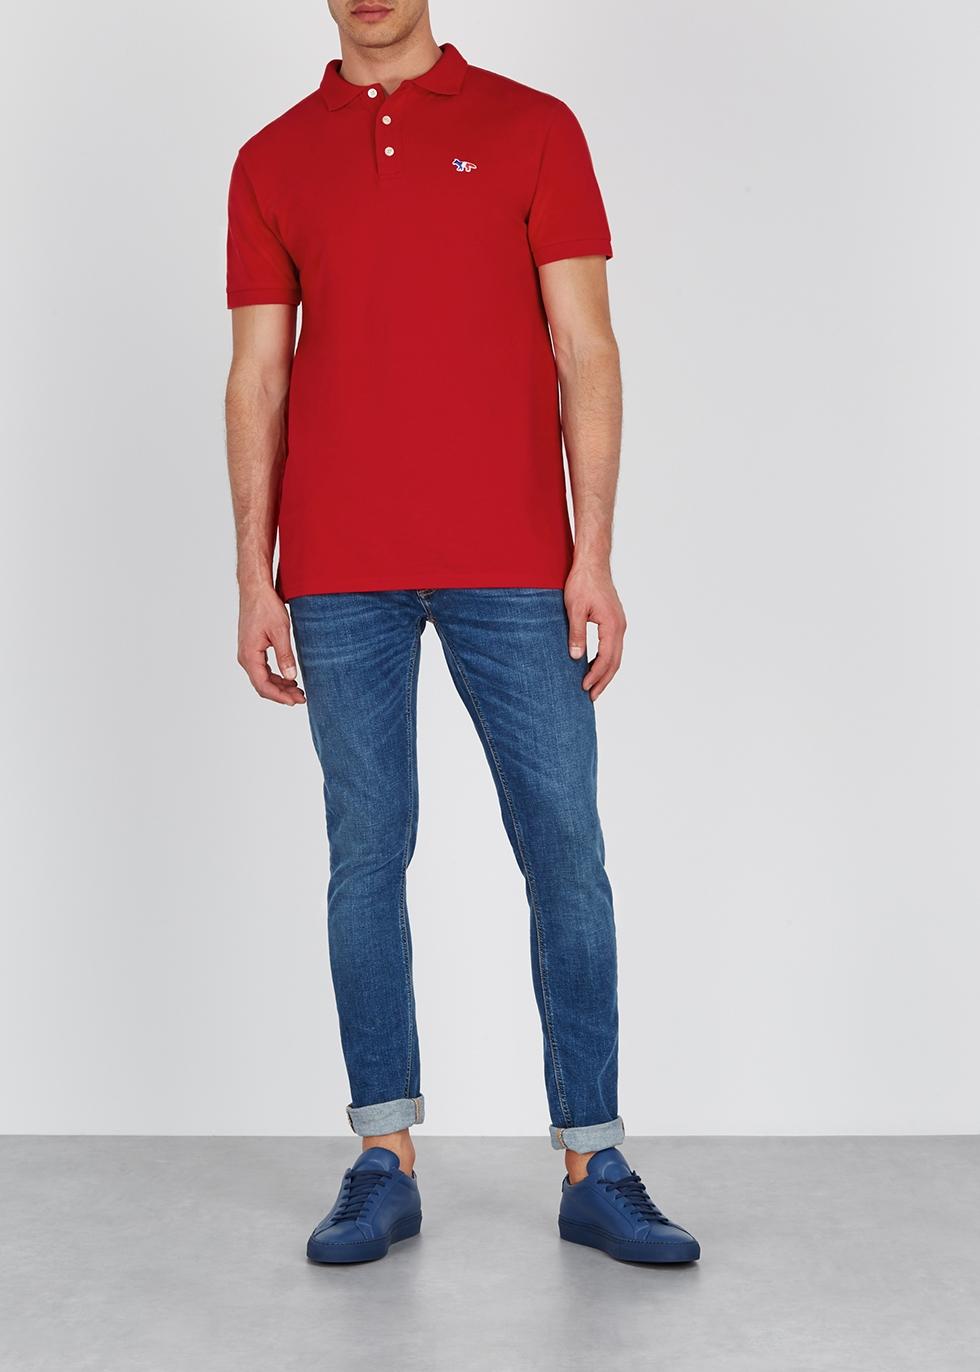 Red cotton polo shirt - Maison Kitsuné